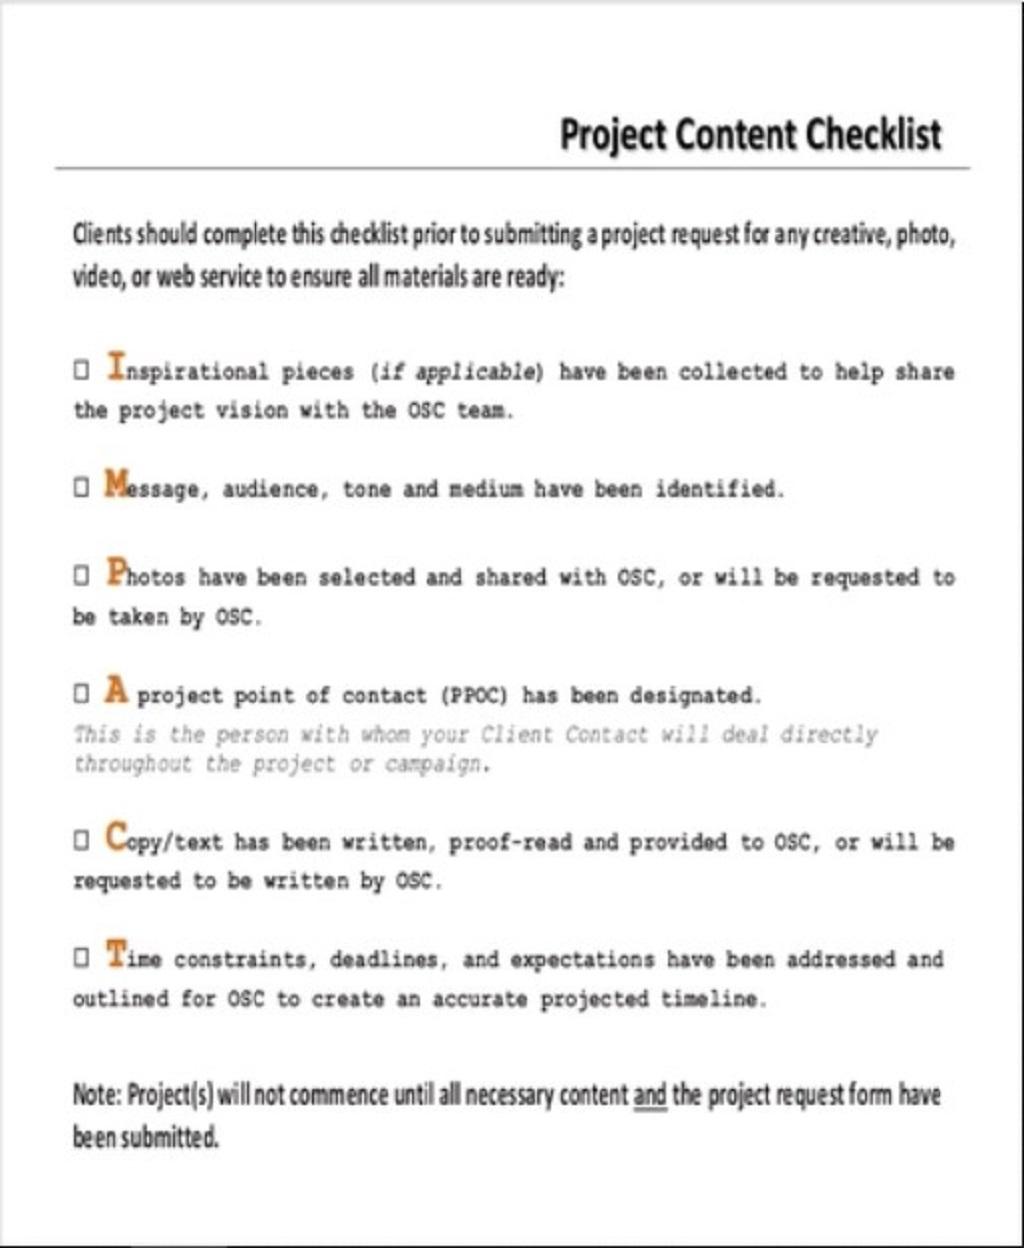 Project Content Checklist Sample PDF